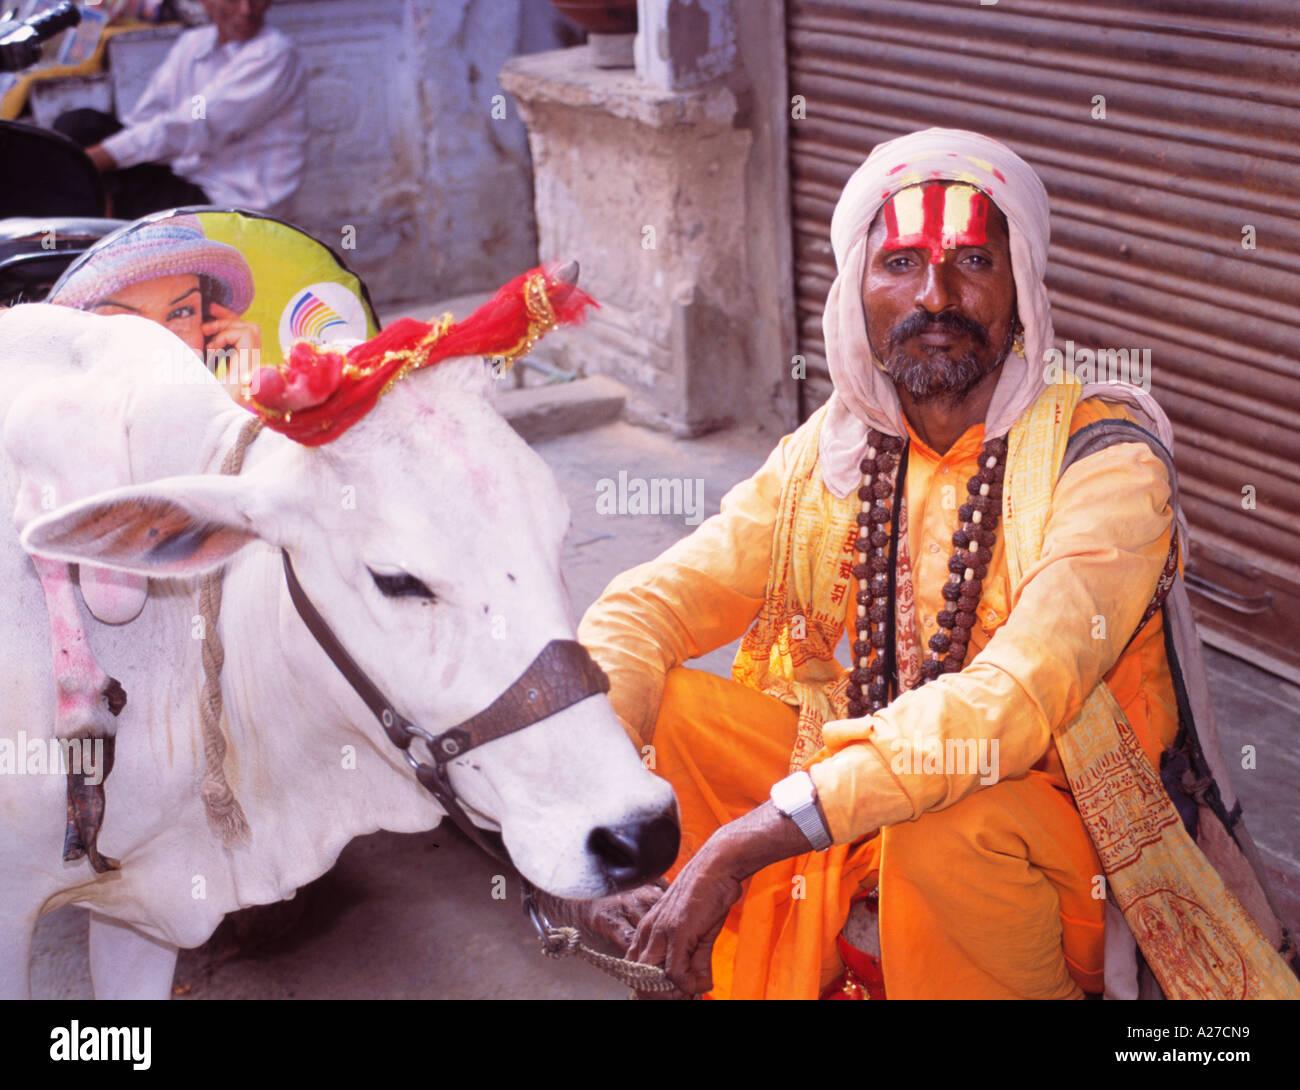 INDIA RAJASTHAN PUSHKAR BEGGAR WITH COW - Stock Image